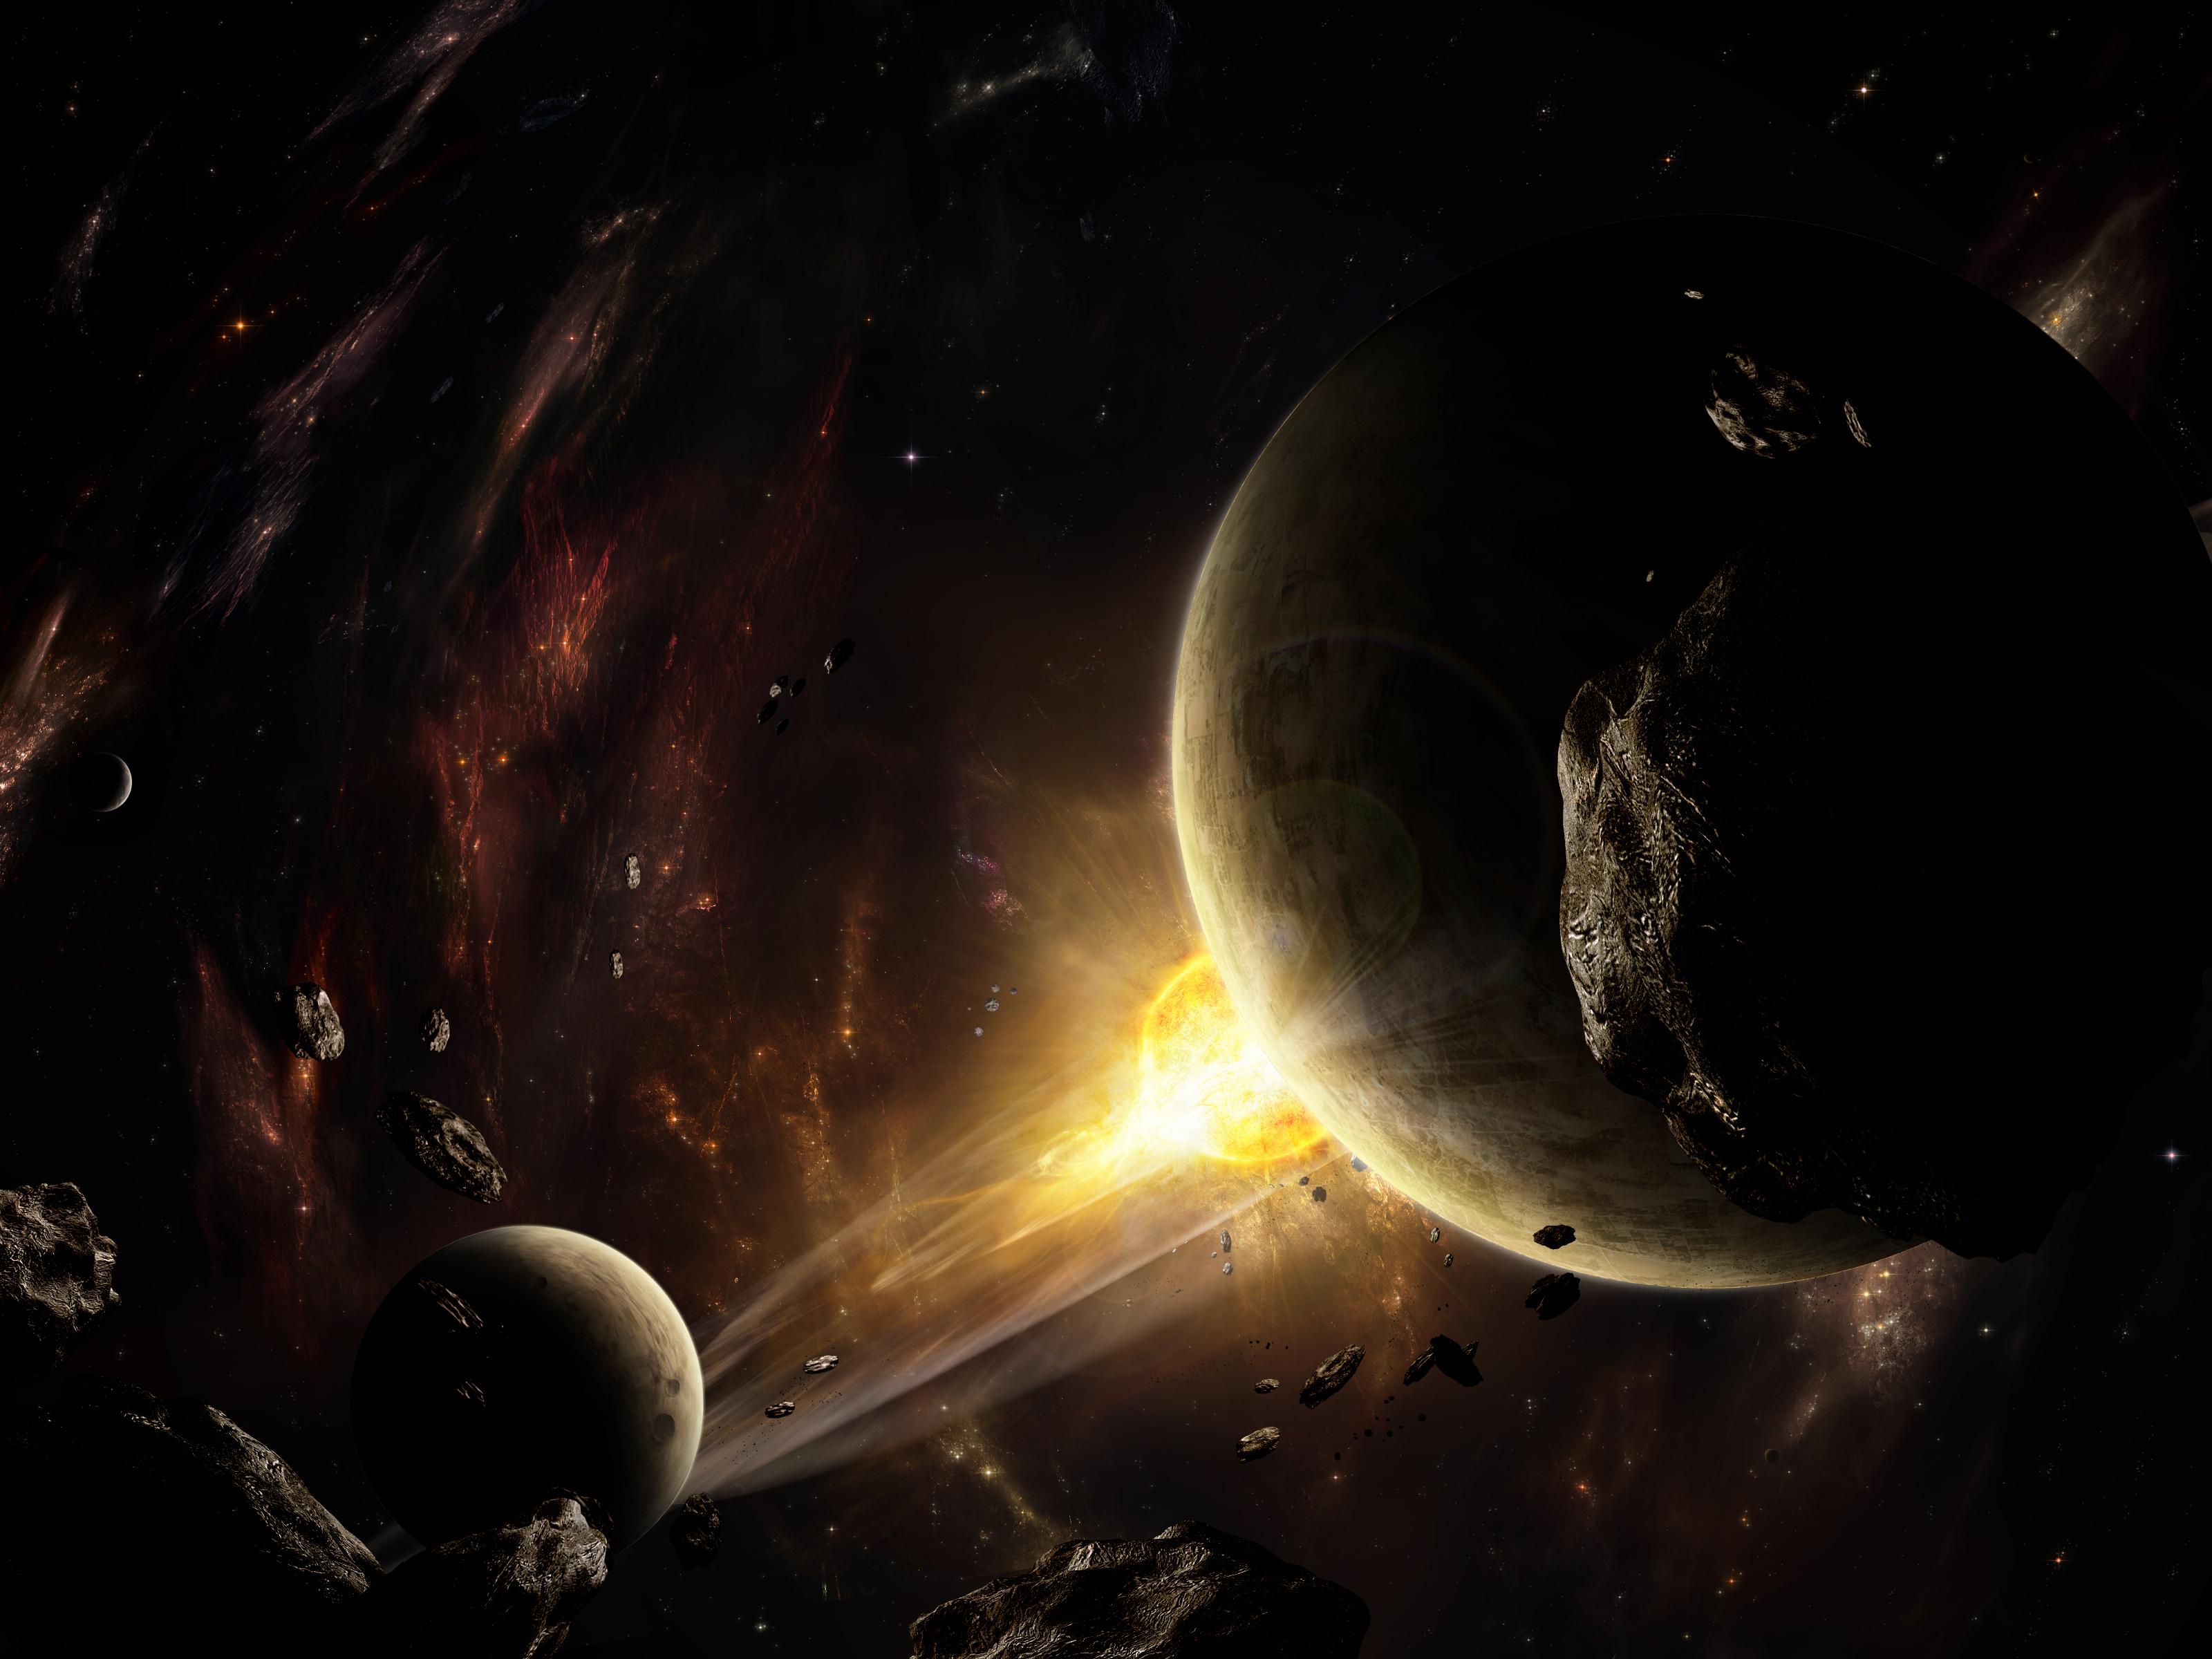 Обои планета космос комета свечение картинки на рабочий ...